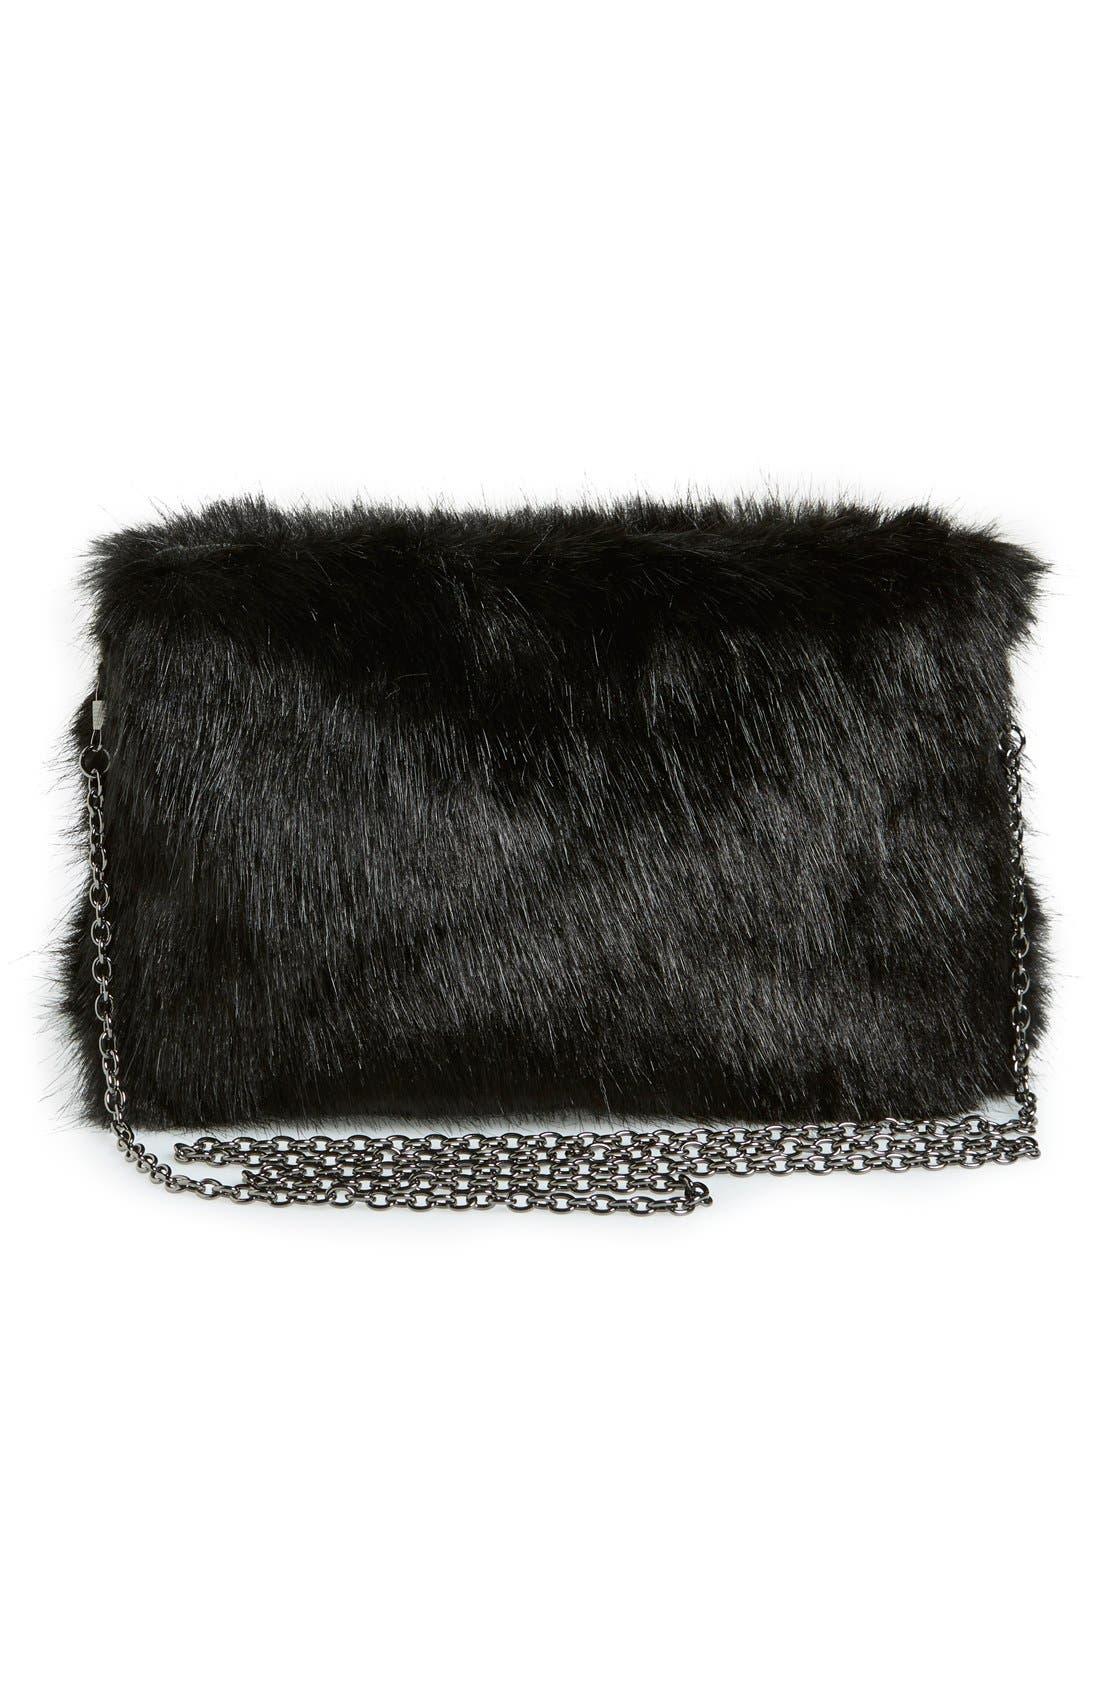 LA DOUBLE 7,                             No Brand Needed Faux Fur Convertible Clutch,                             Alternate thumbnail 5, color,                             001